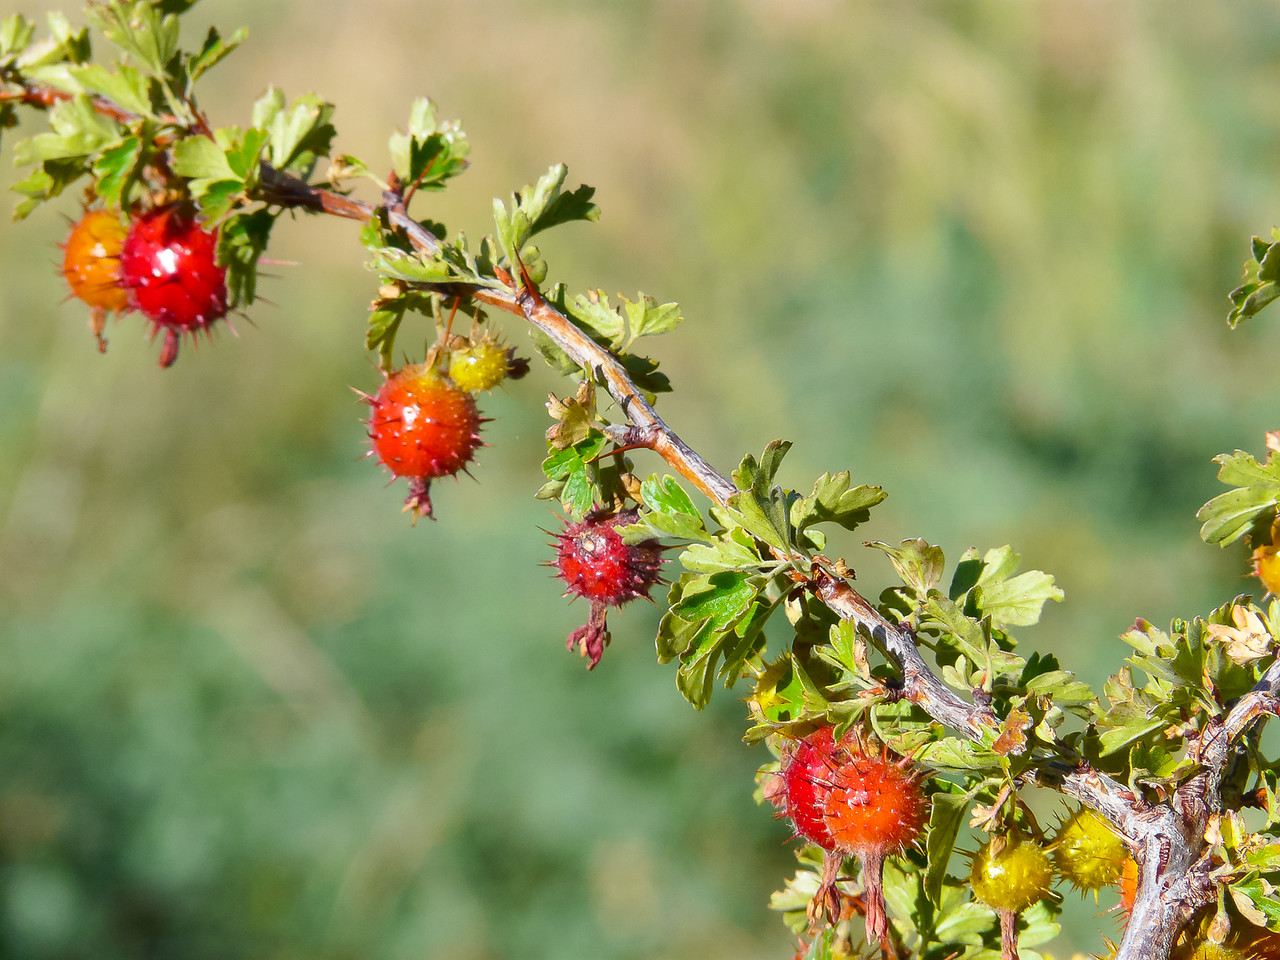 Ribes roezlii, the Sierra gooseberry.